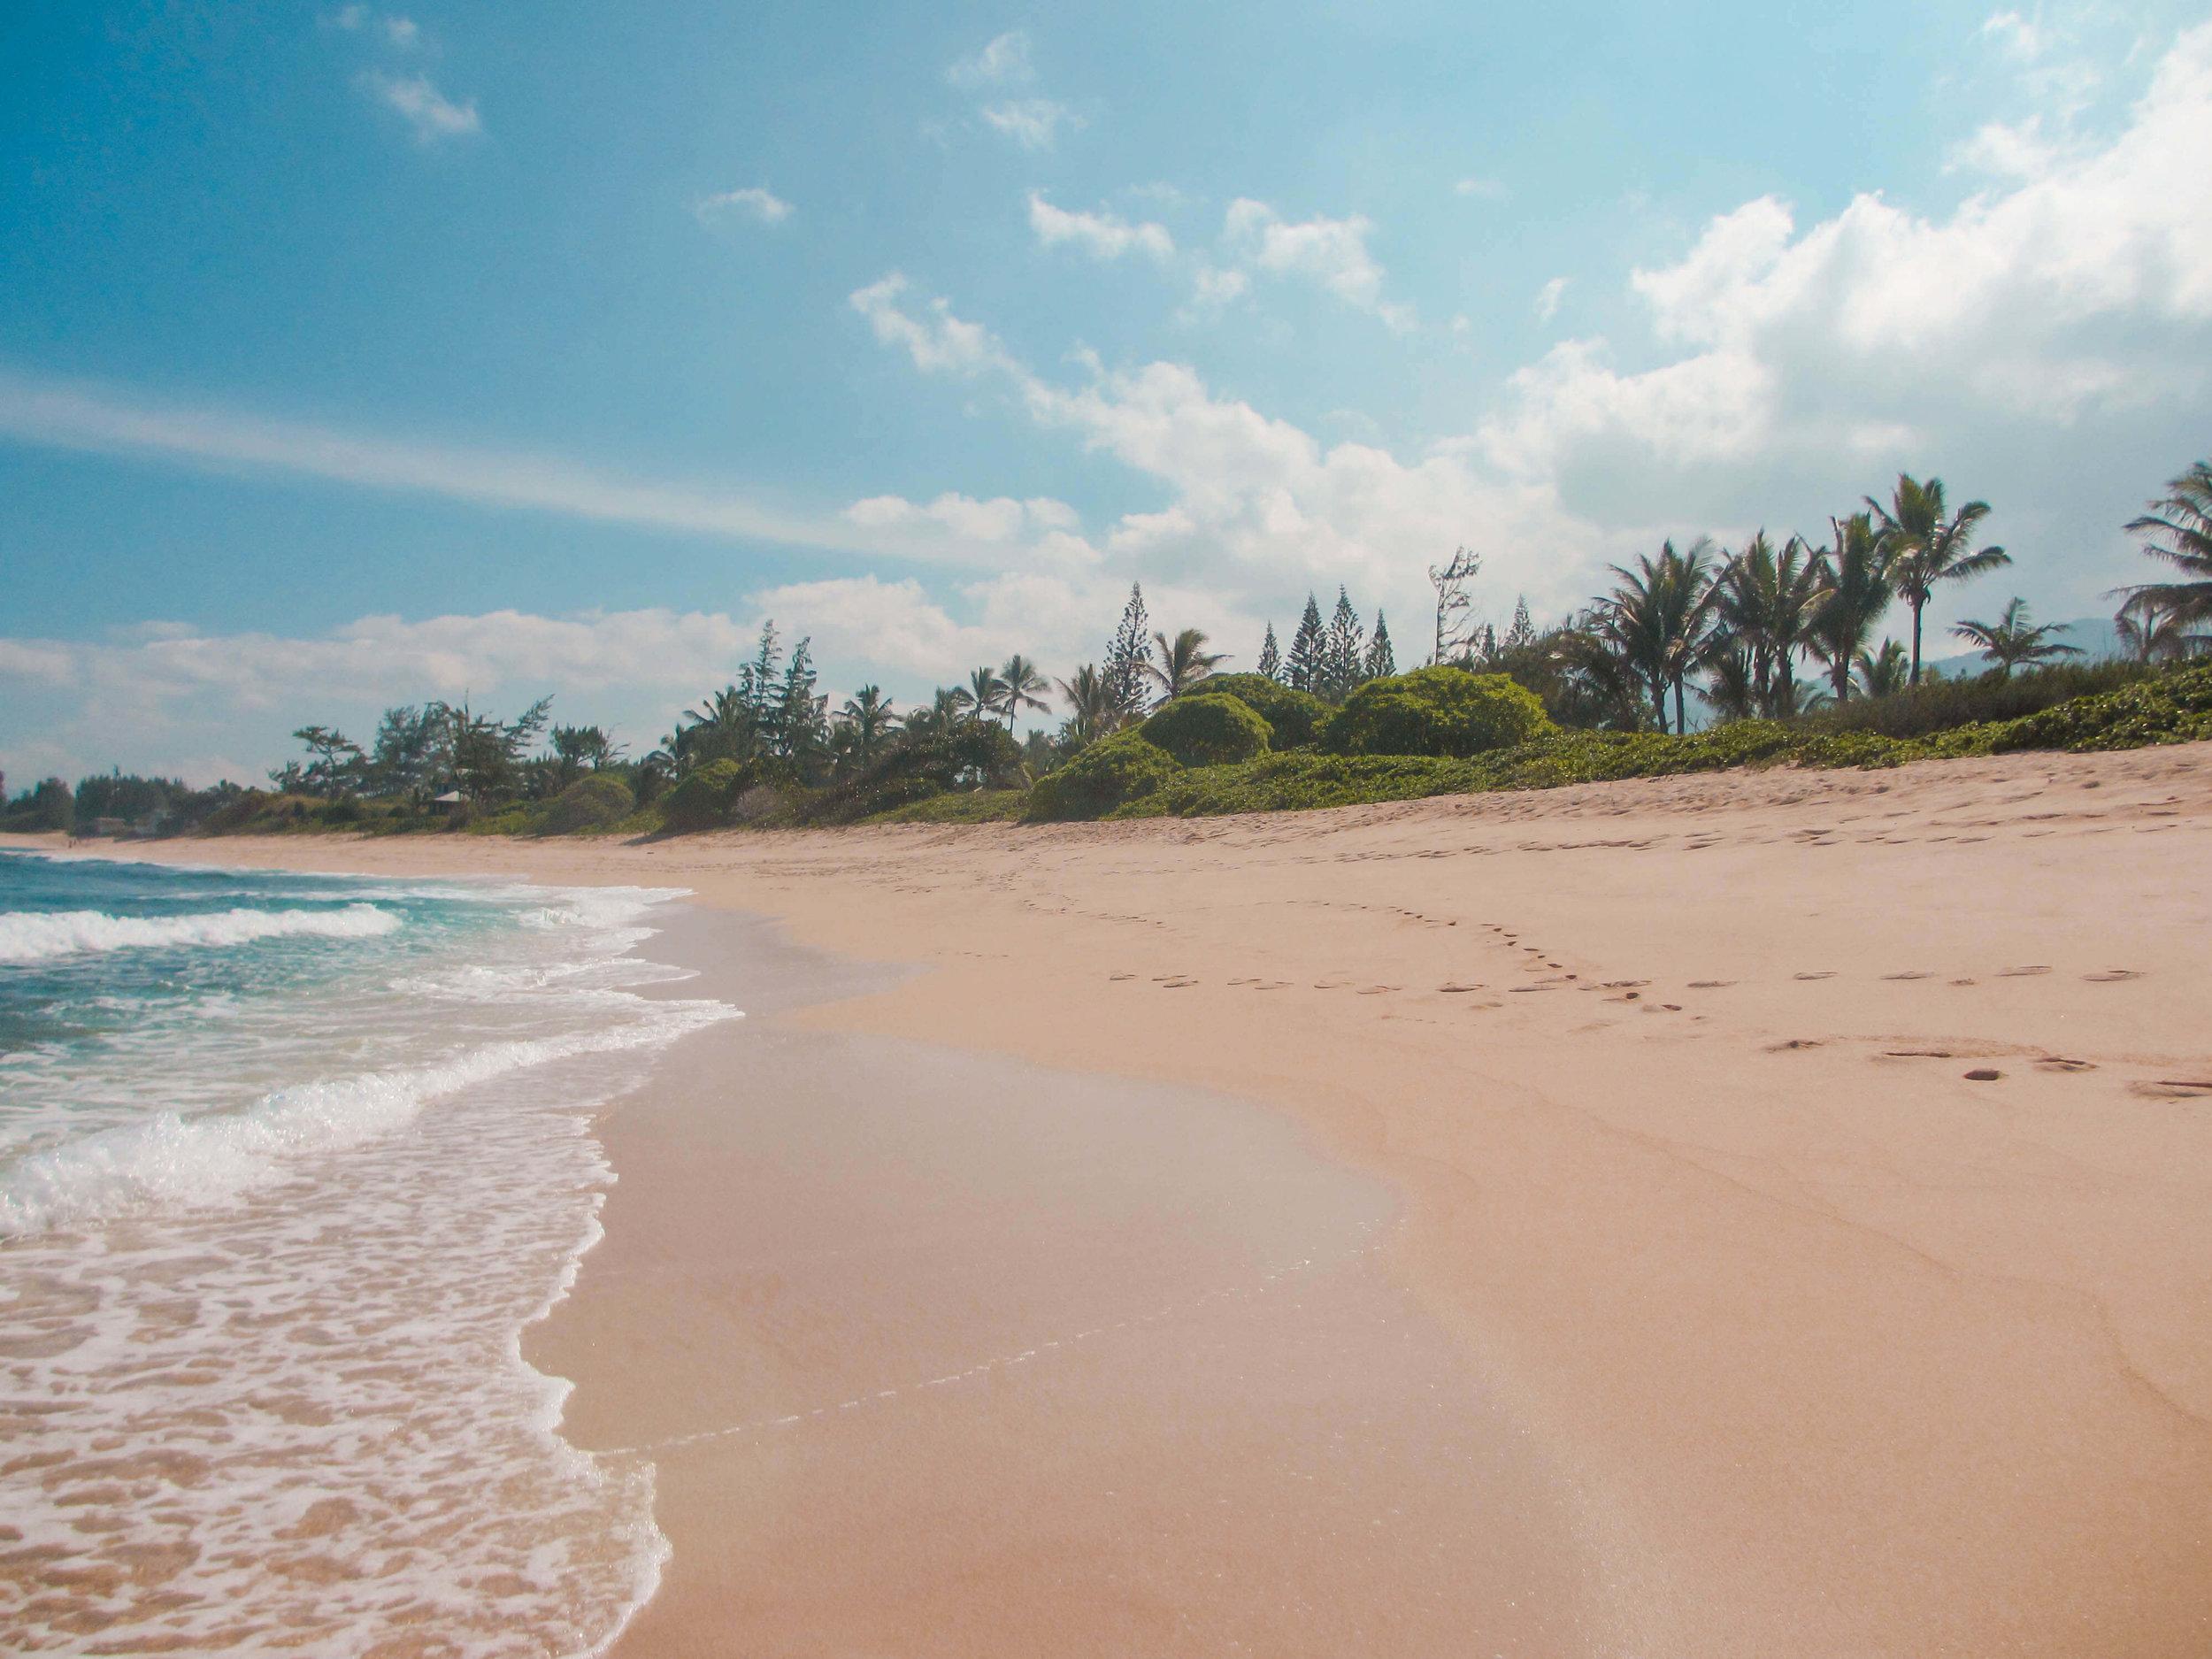 Beach Oahu Hawaii